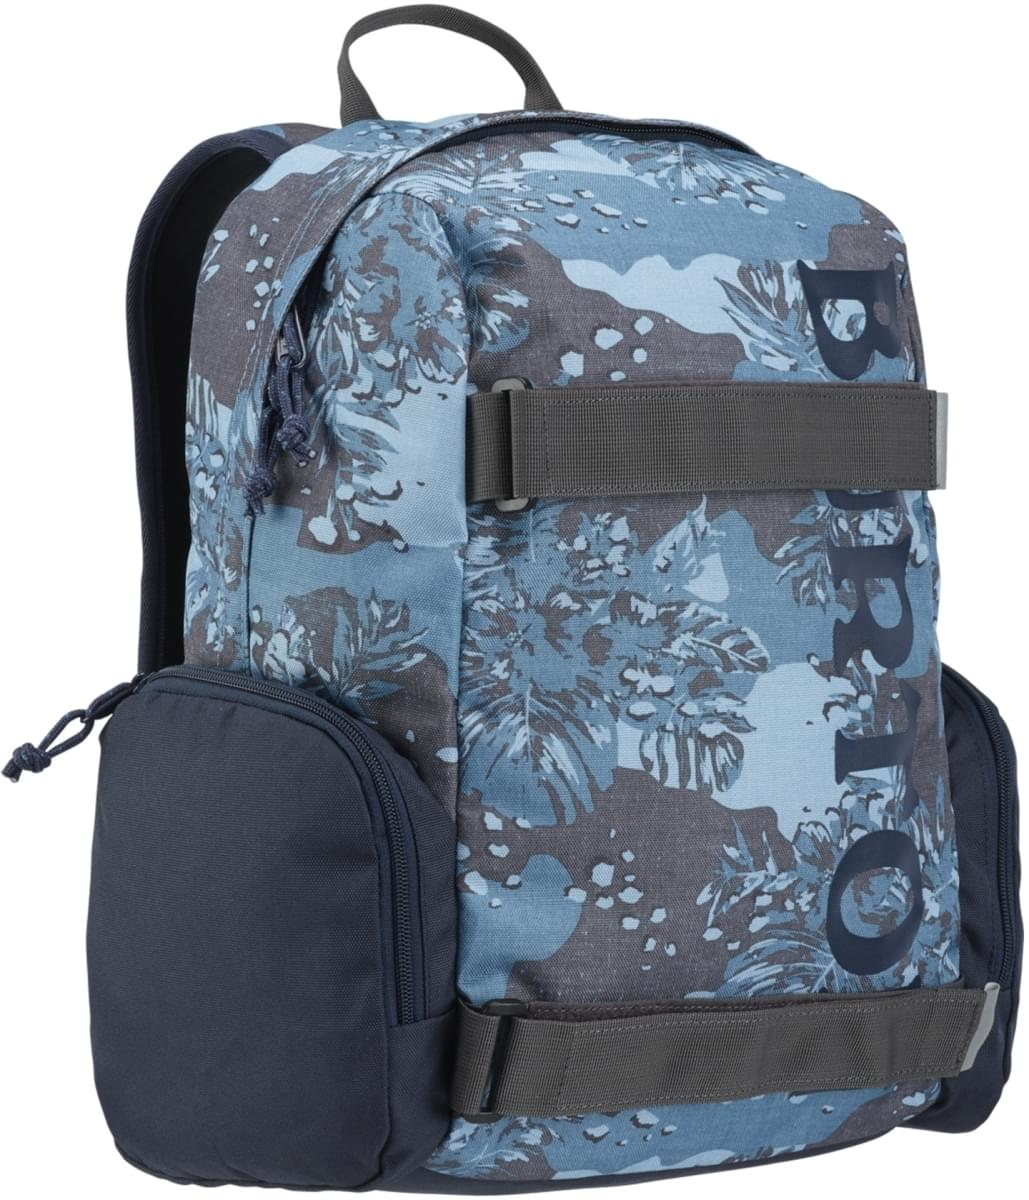 1478d0571ad Dětský batoh Burton Youth Emphasis - saxony blue hawaiian - Skibi Kids